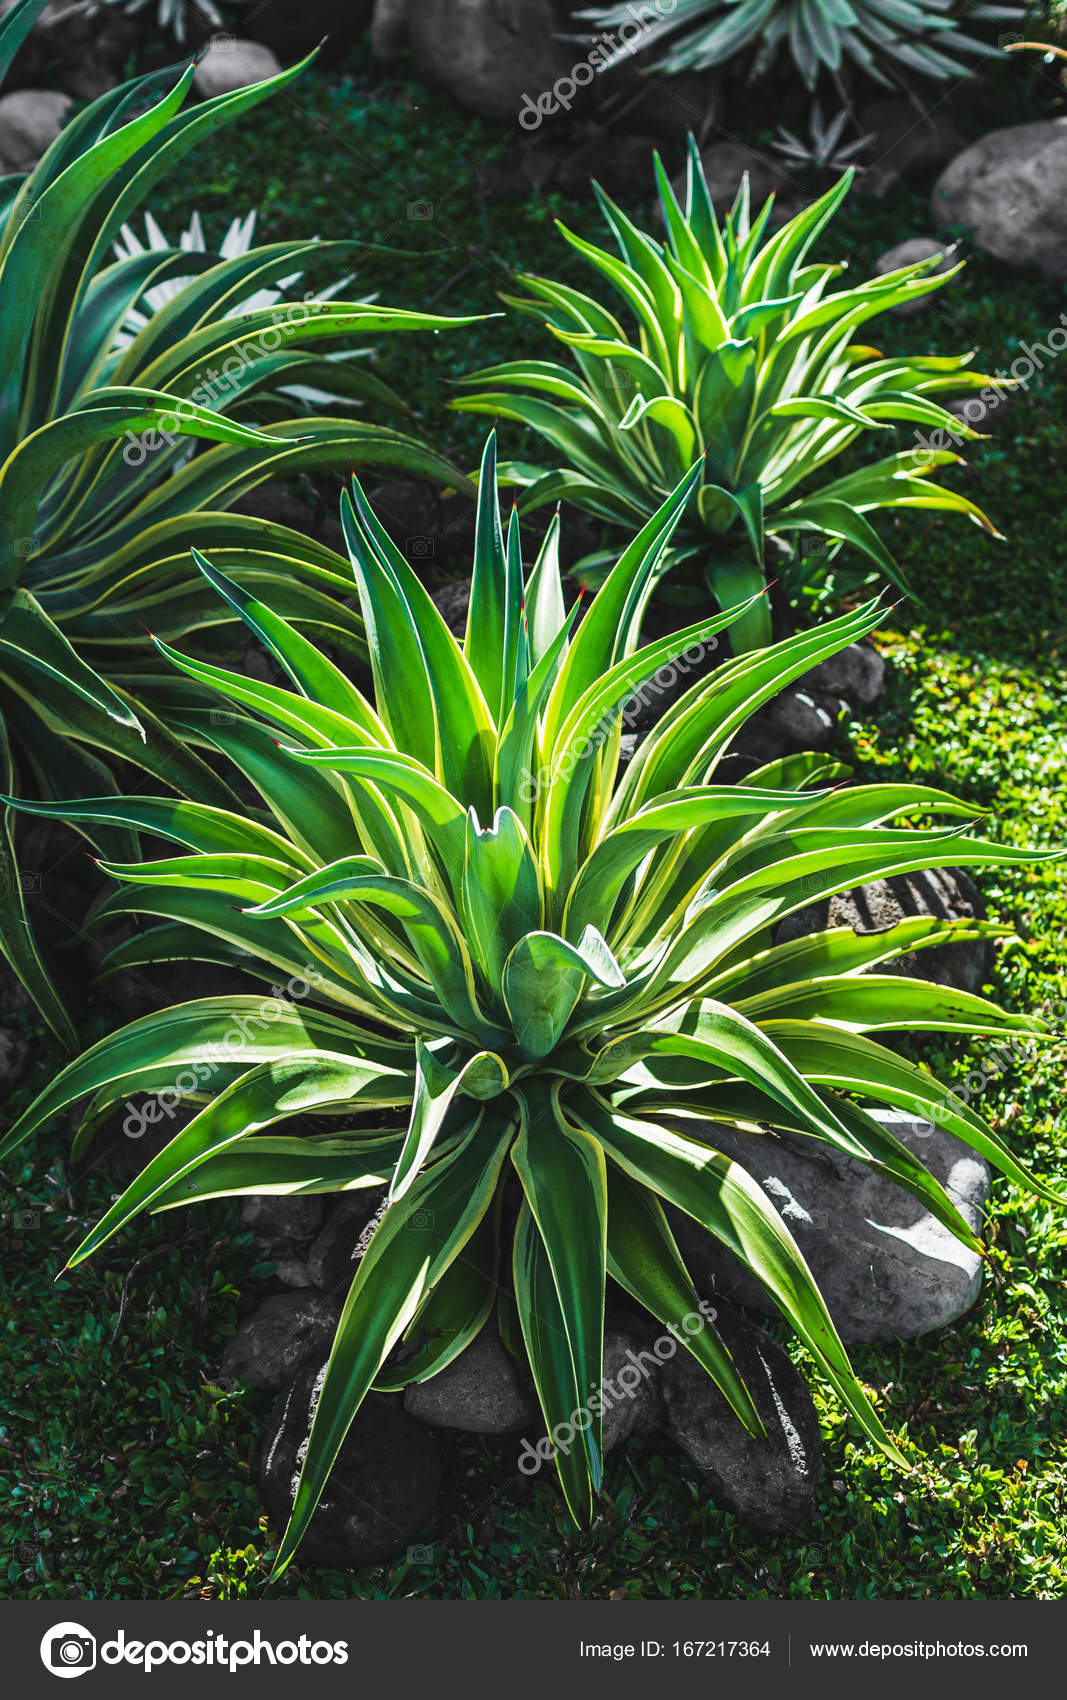 Tropische Pflanzen im Garten — Stockfoto © olegbreslavtsev #167217364